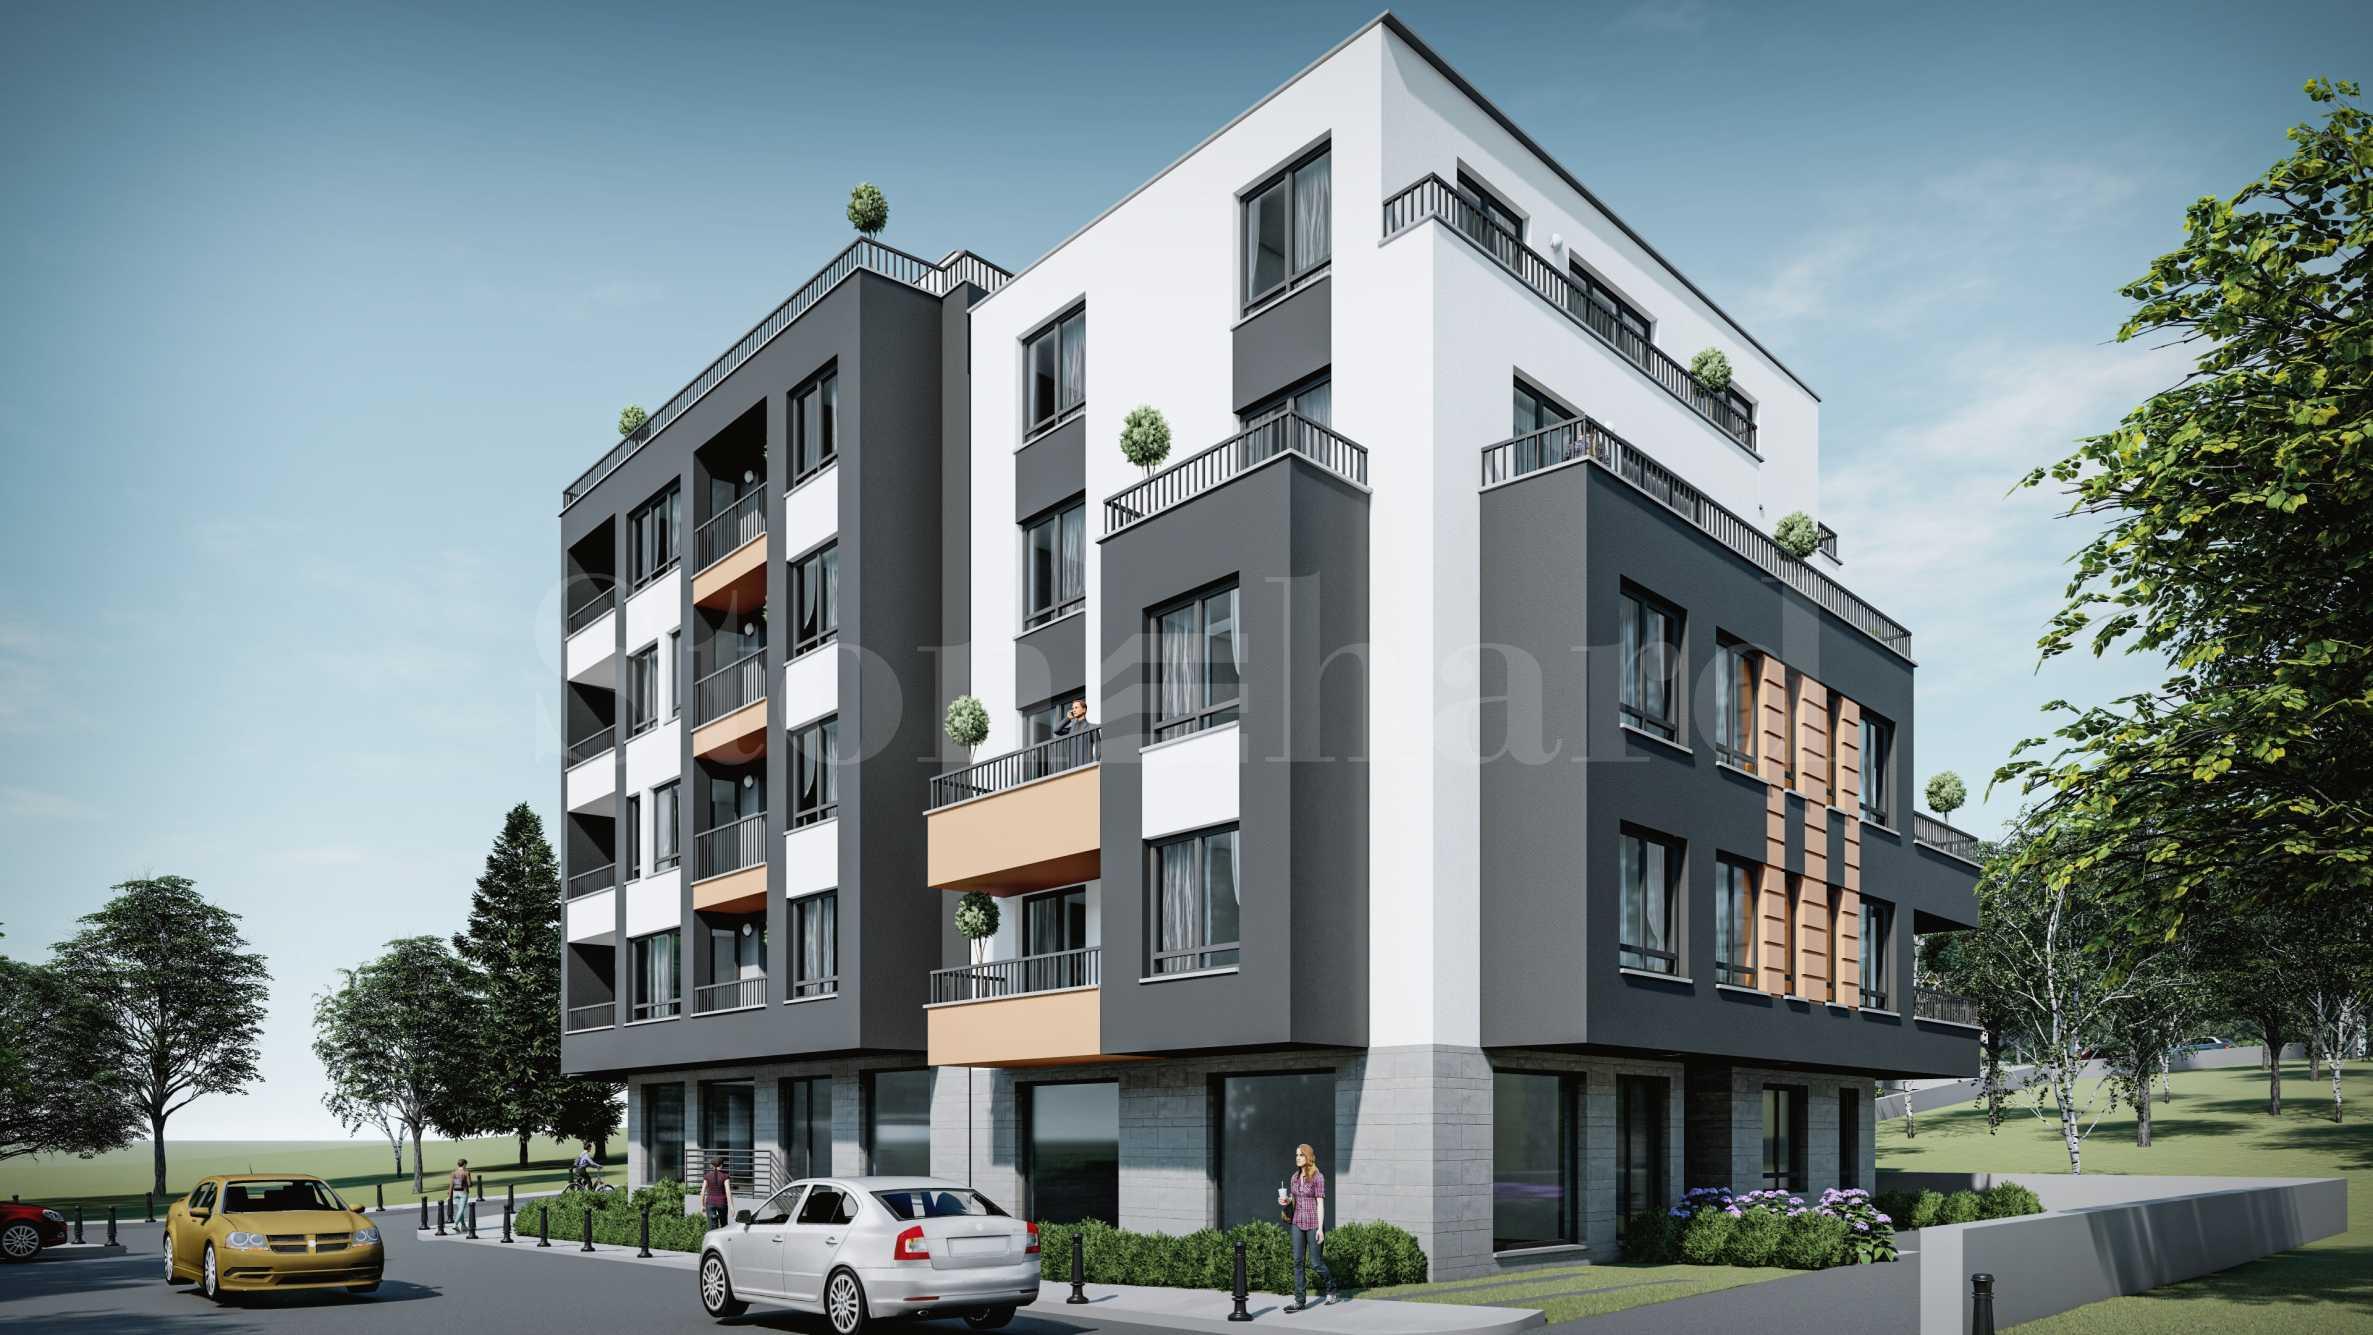 Атрактивни нови жилища в жилищна сграда в столичния кв. Дианабад2 - Stonehard